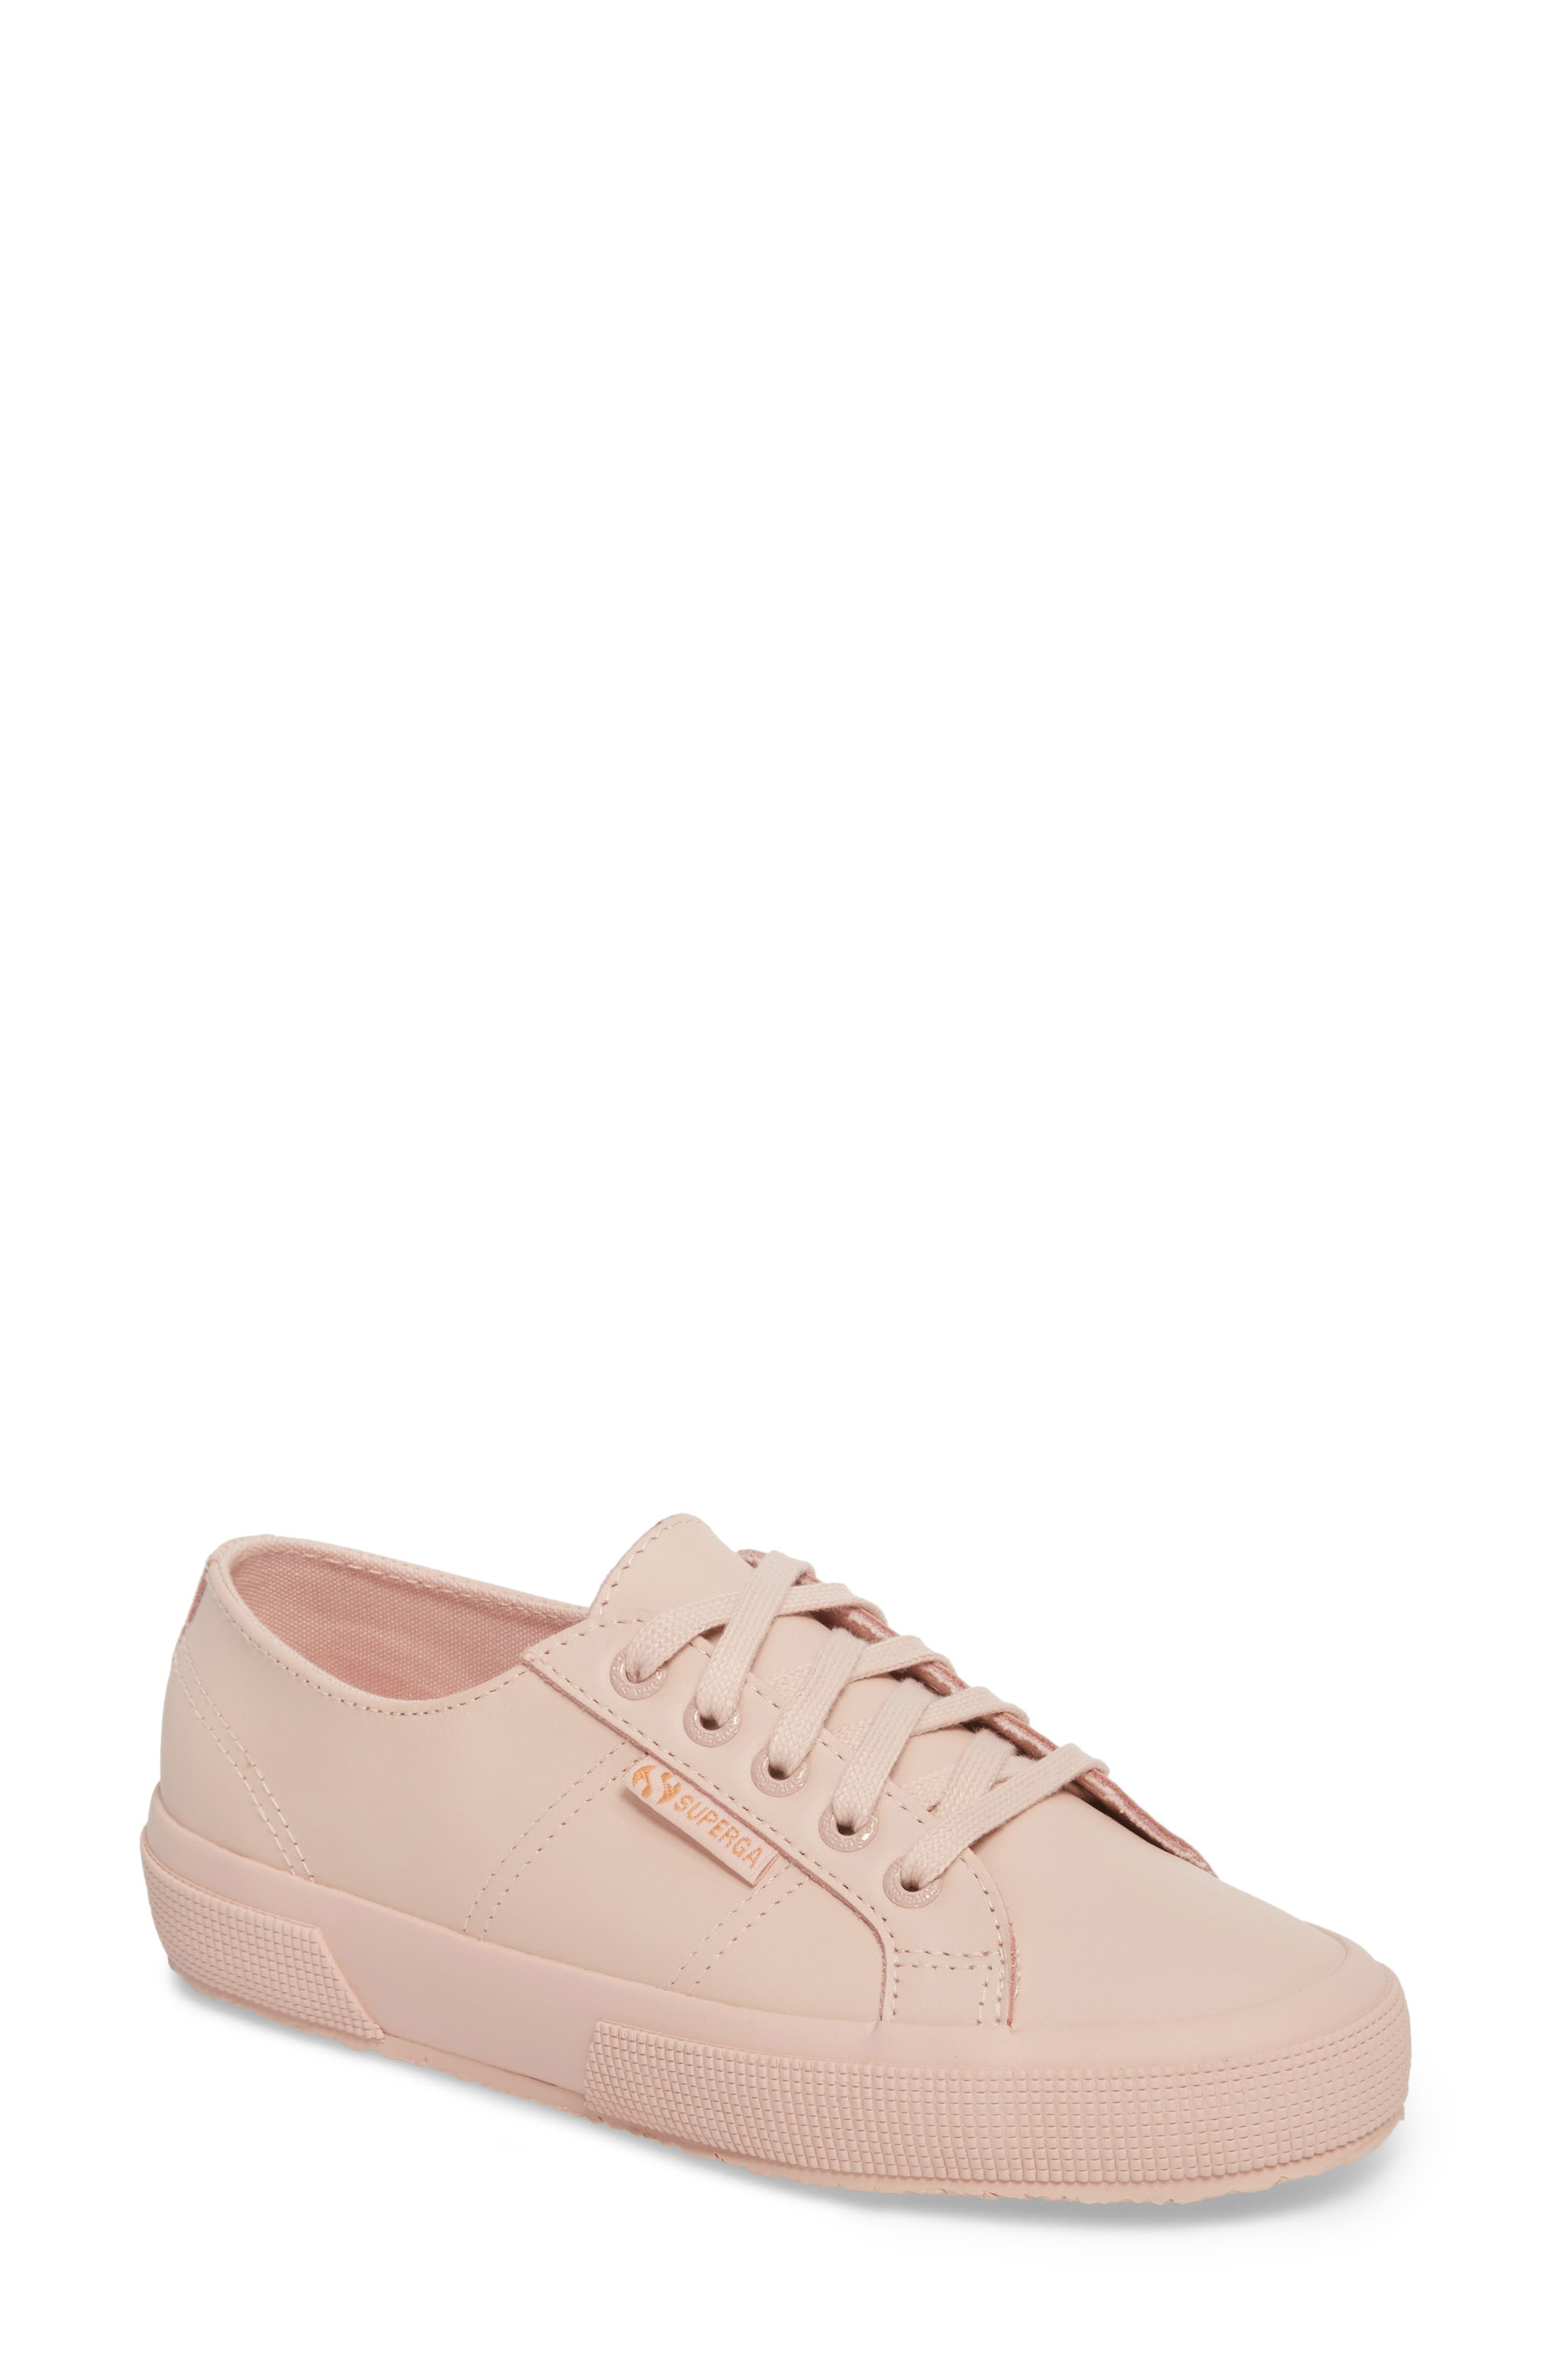 Superga 2750 Sneaker Women New Markdown